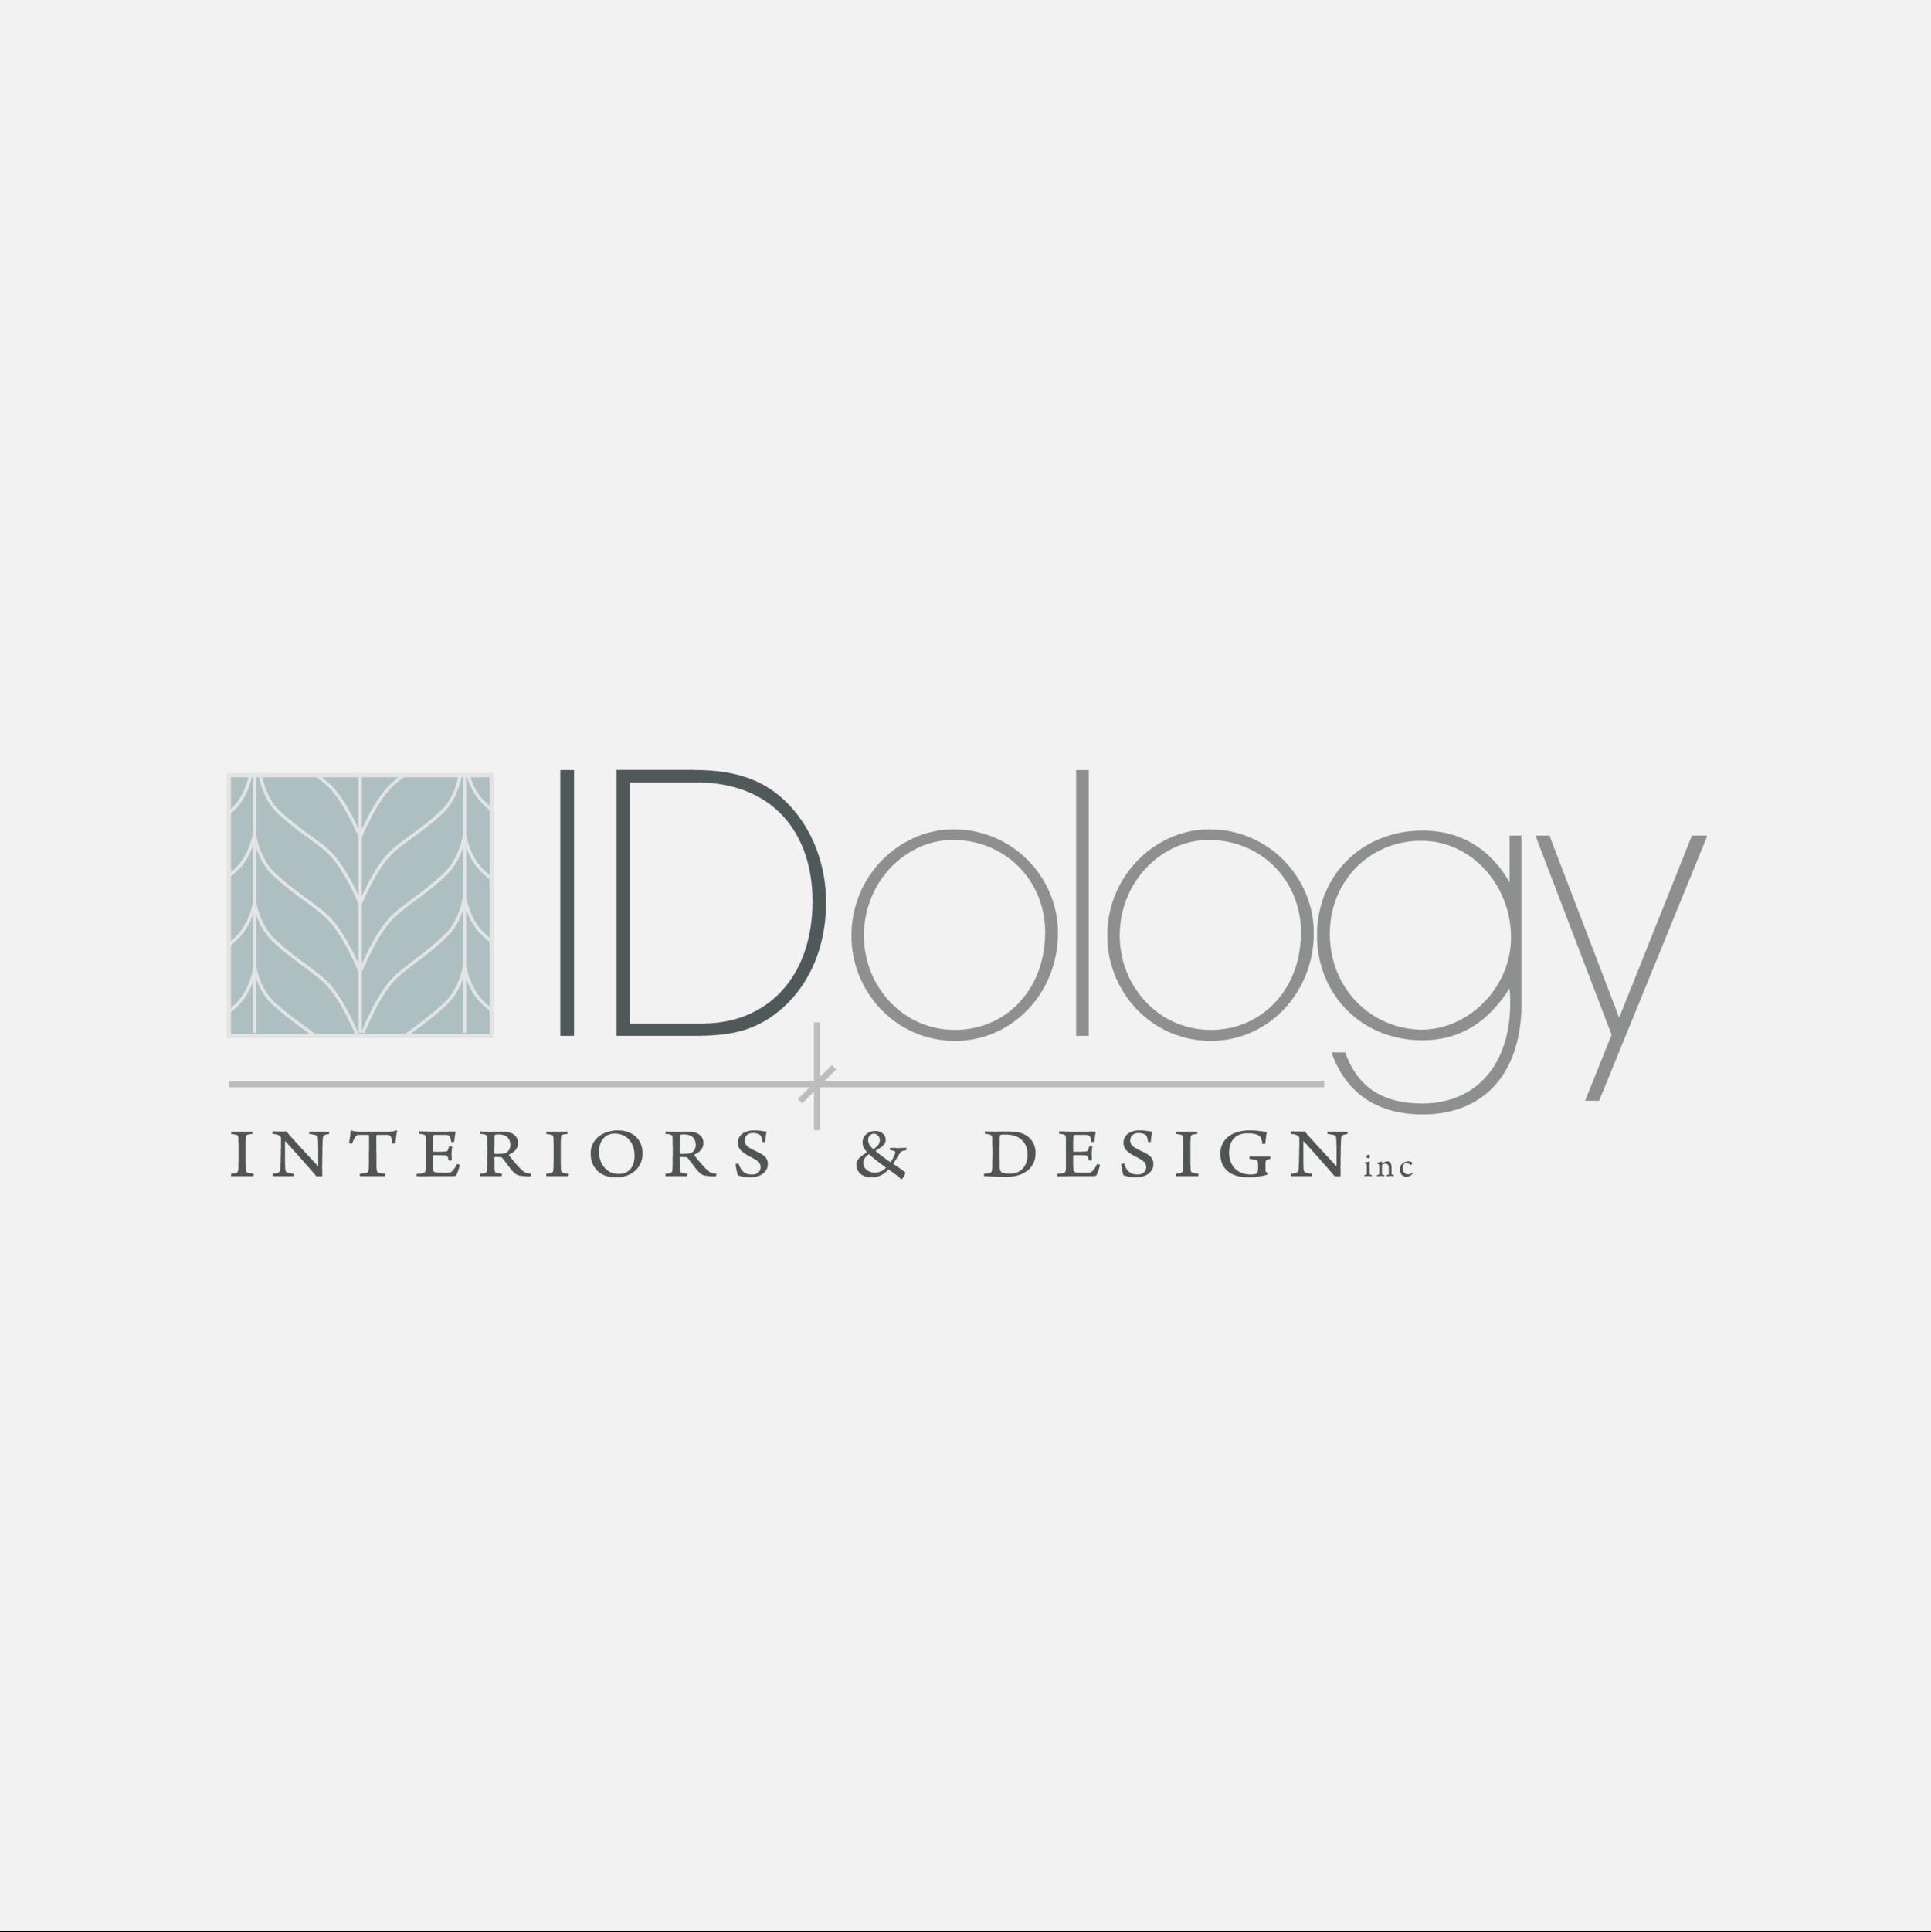 ID.ology_Logo-01.png